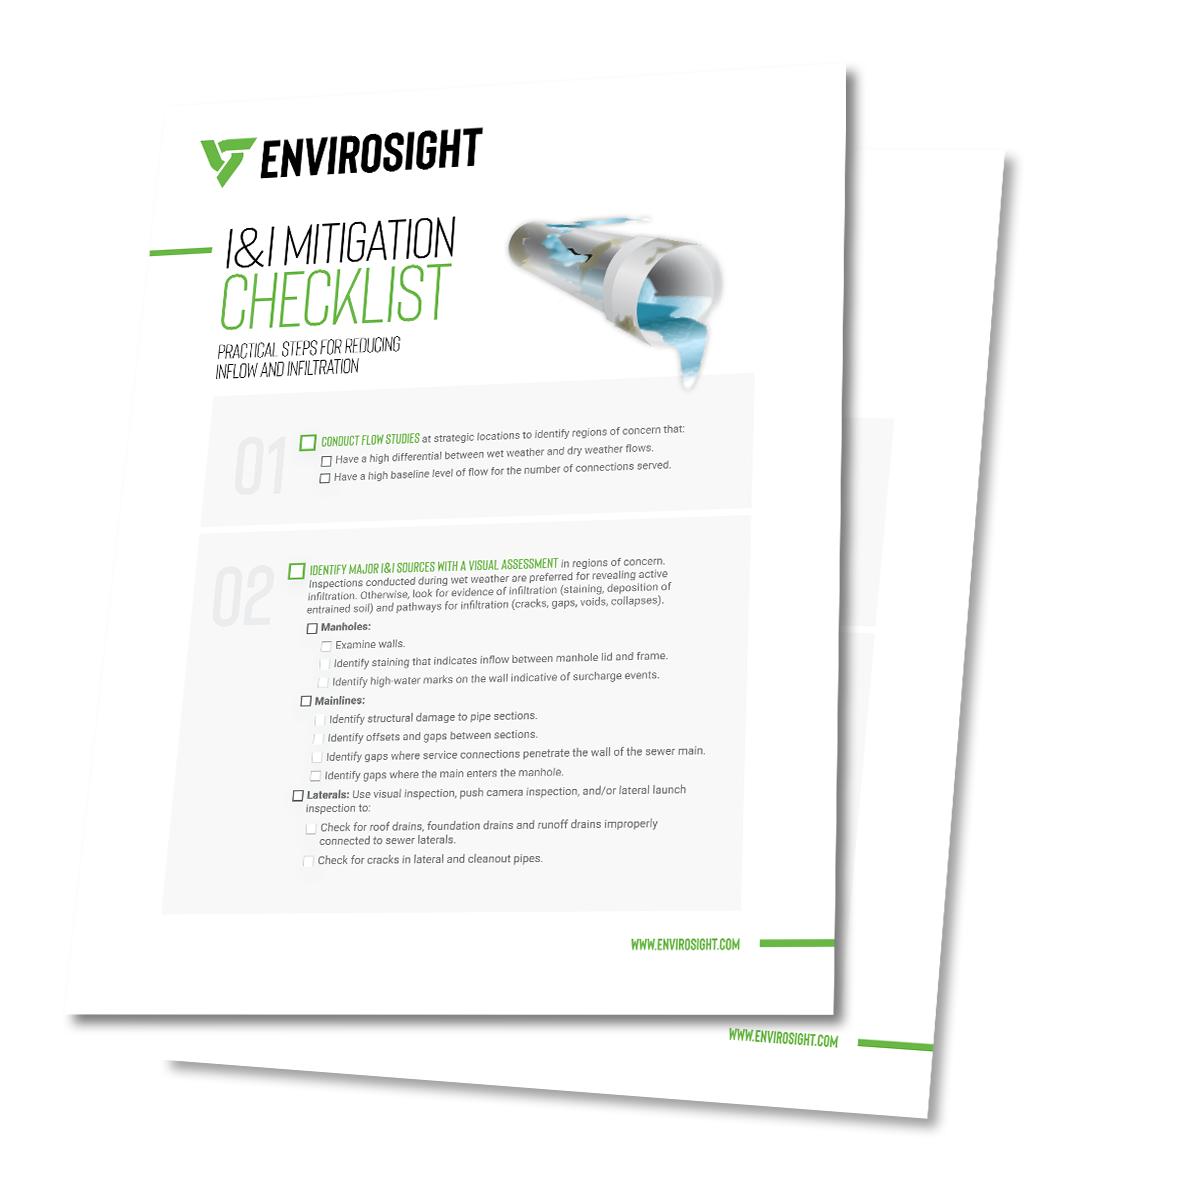 I&I Mitigation Checklist